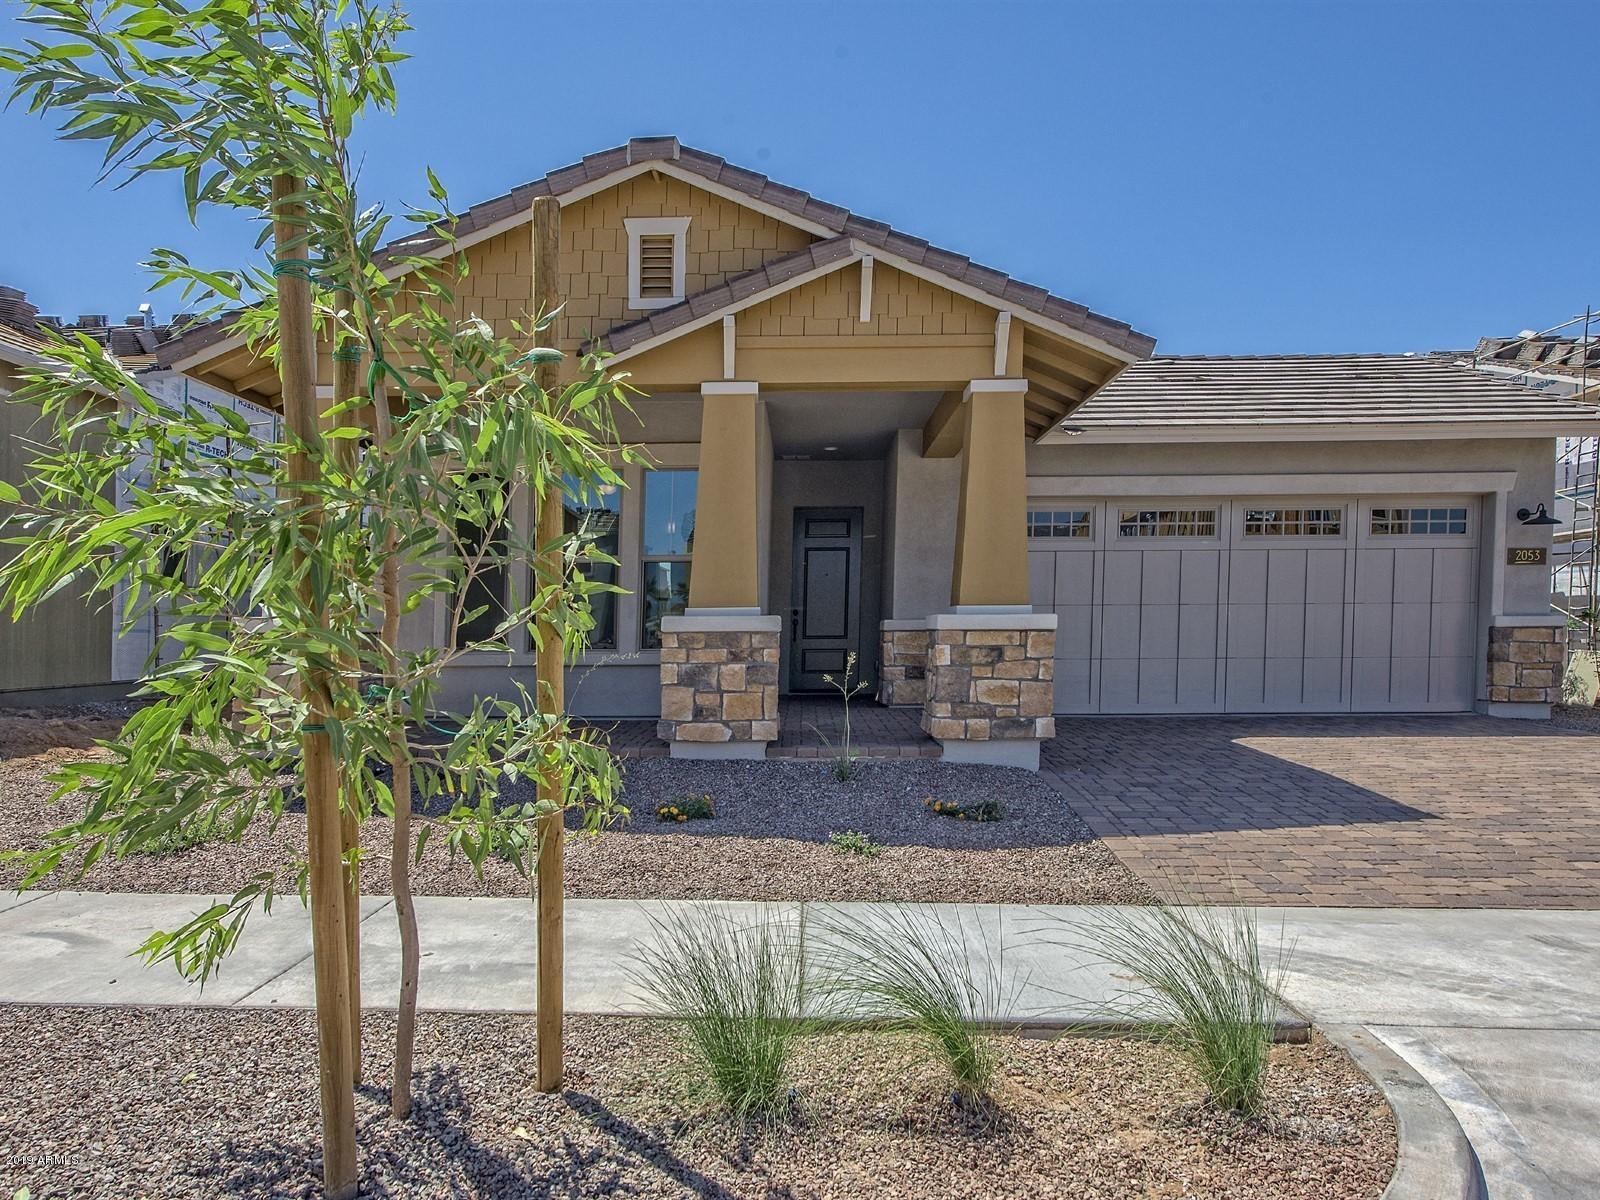 Photo for 2053 W Trotter Trail, Phoenix, AZ 85085 (MLS # 5881919)